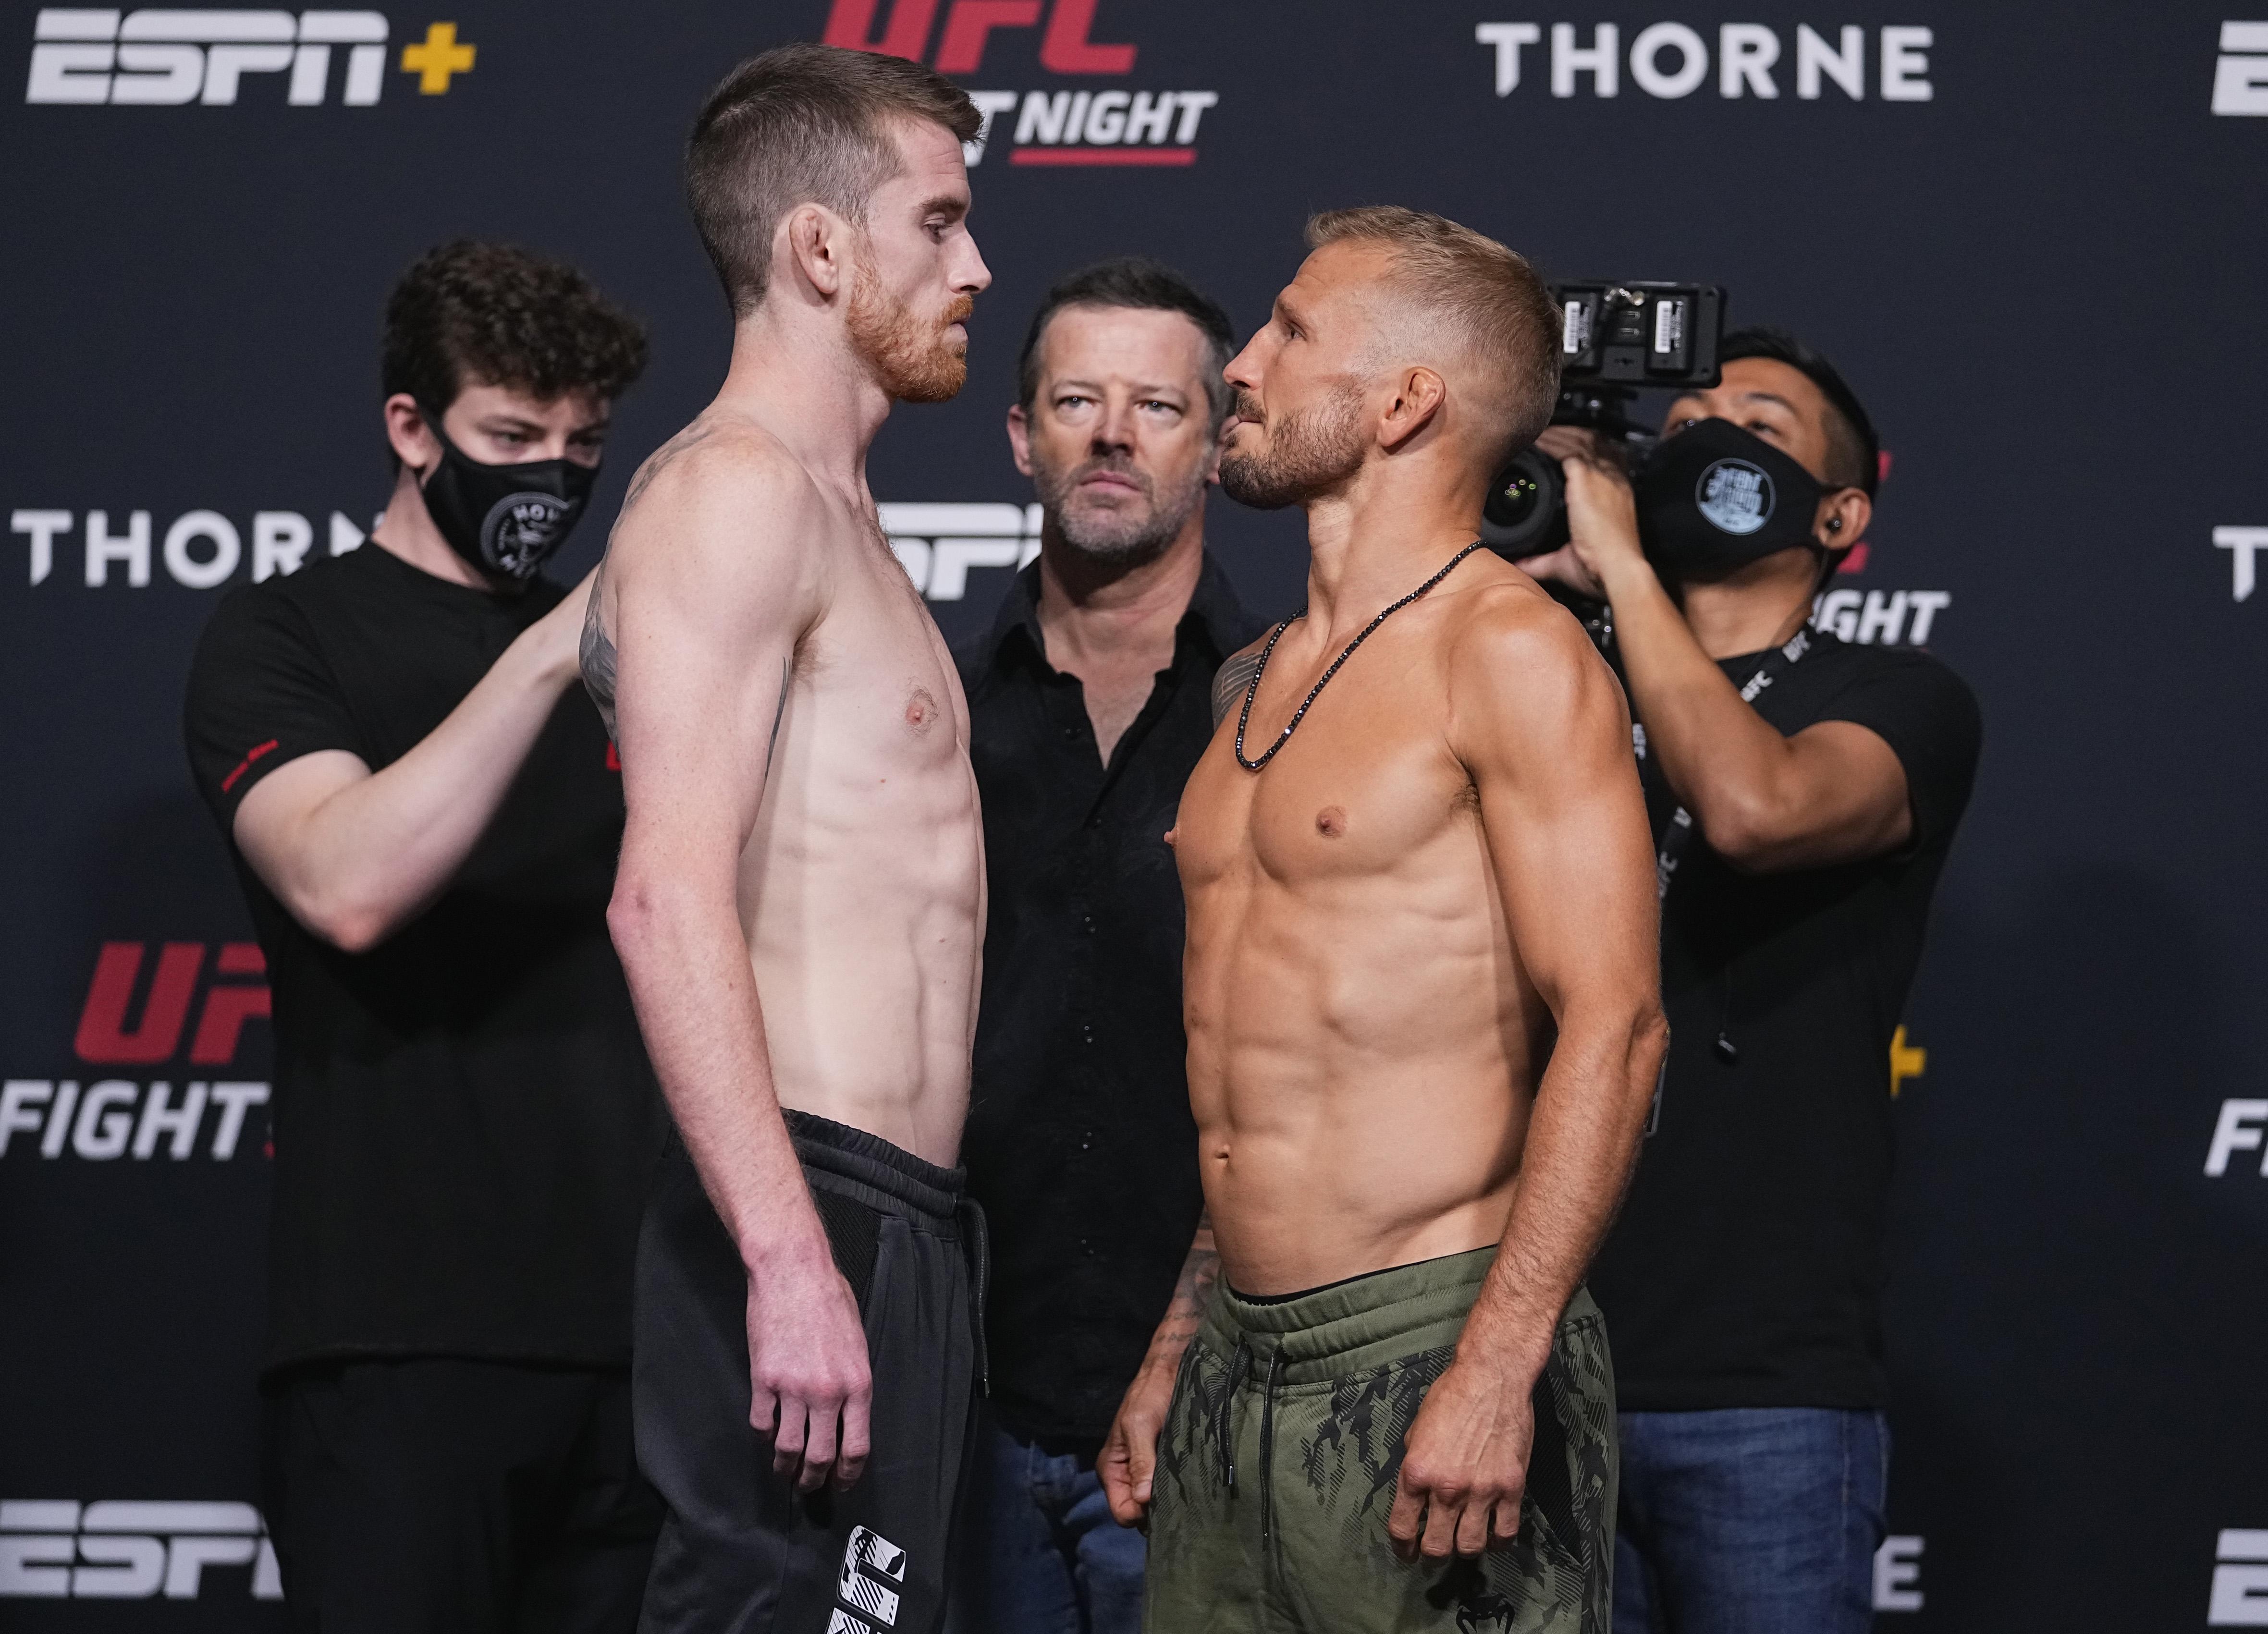 Corey Sandhagen和tj Dillashaw在UFC拉斯维加斯32